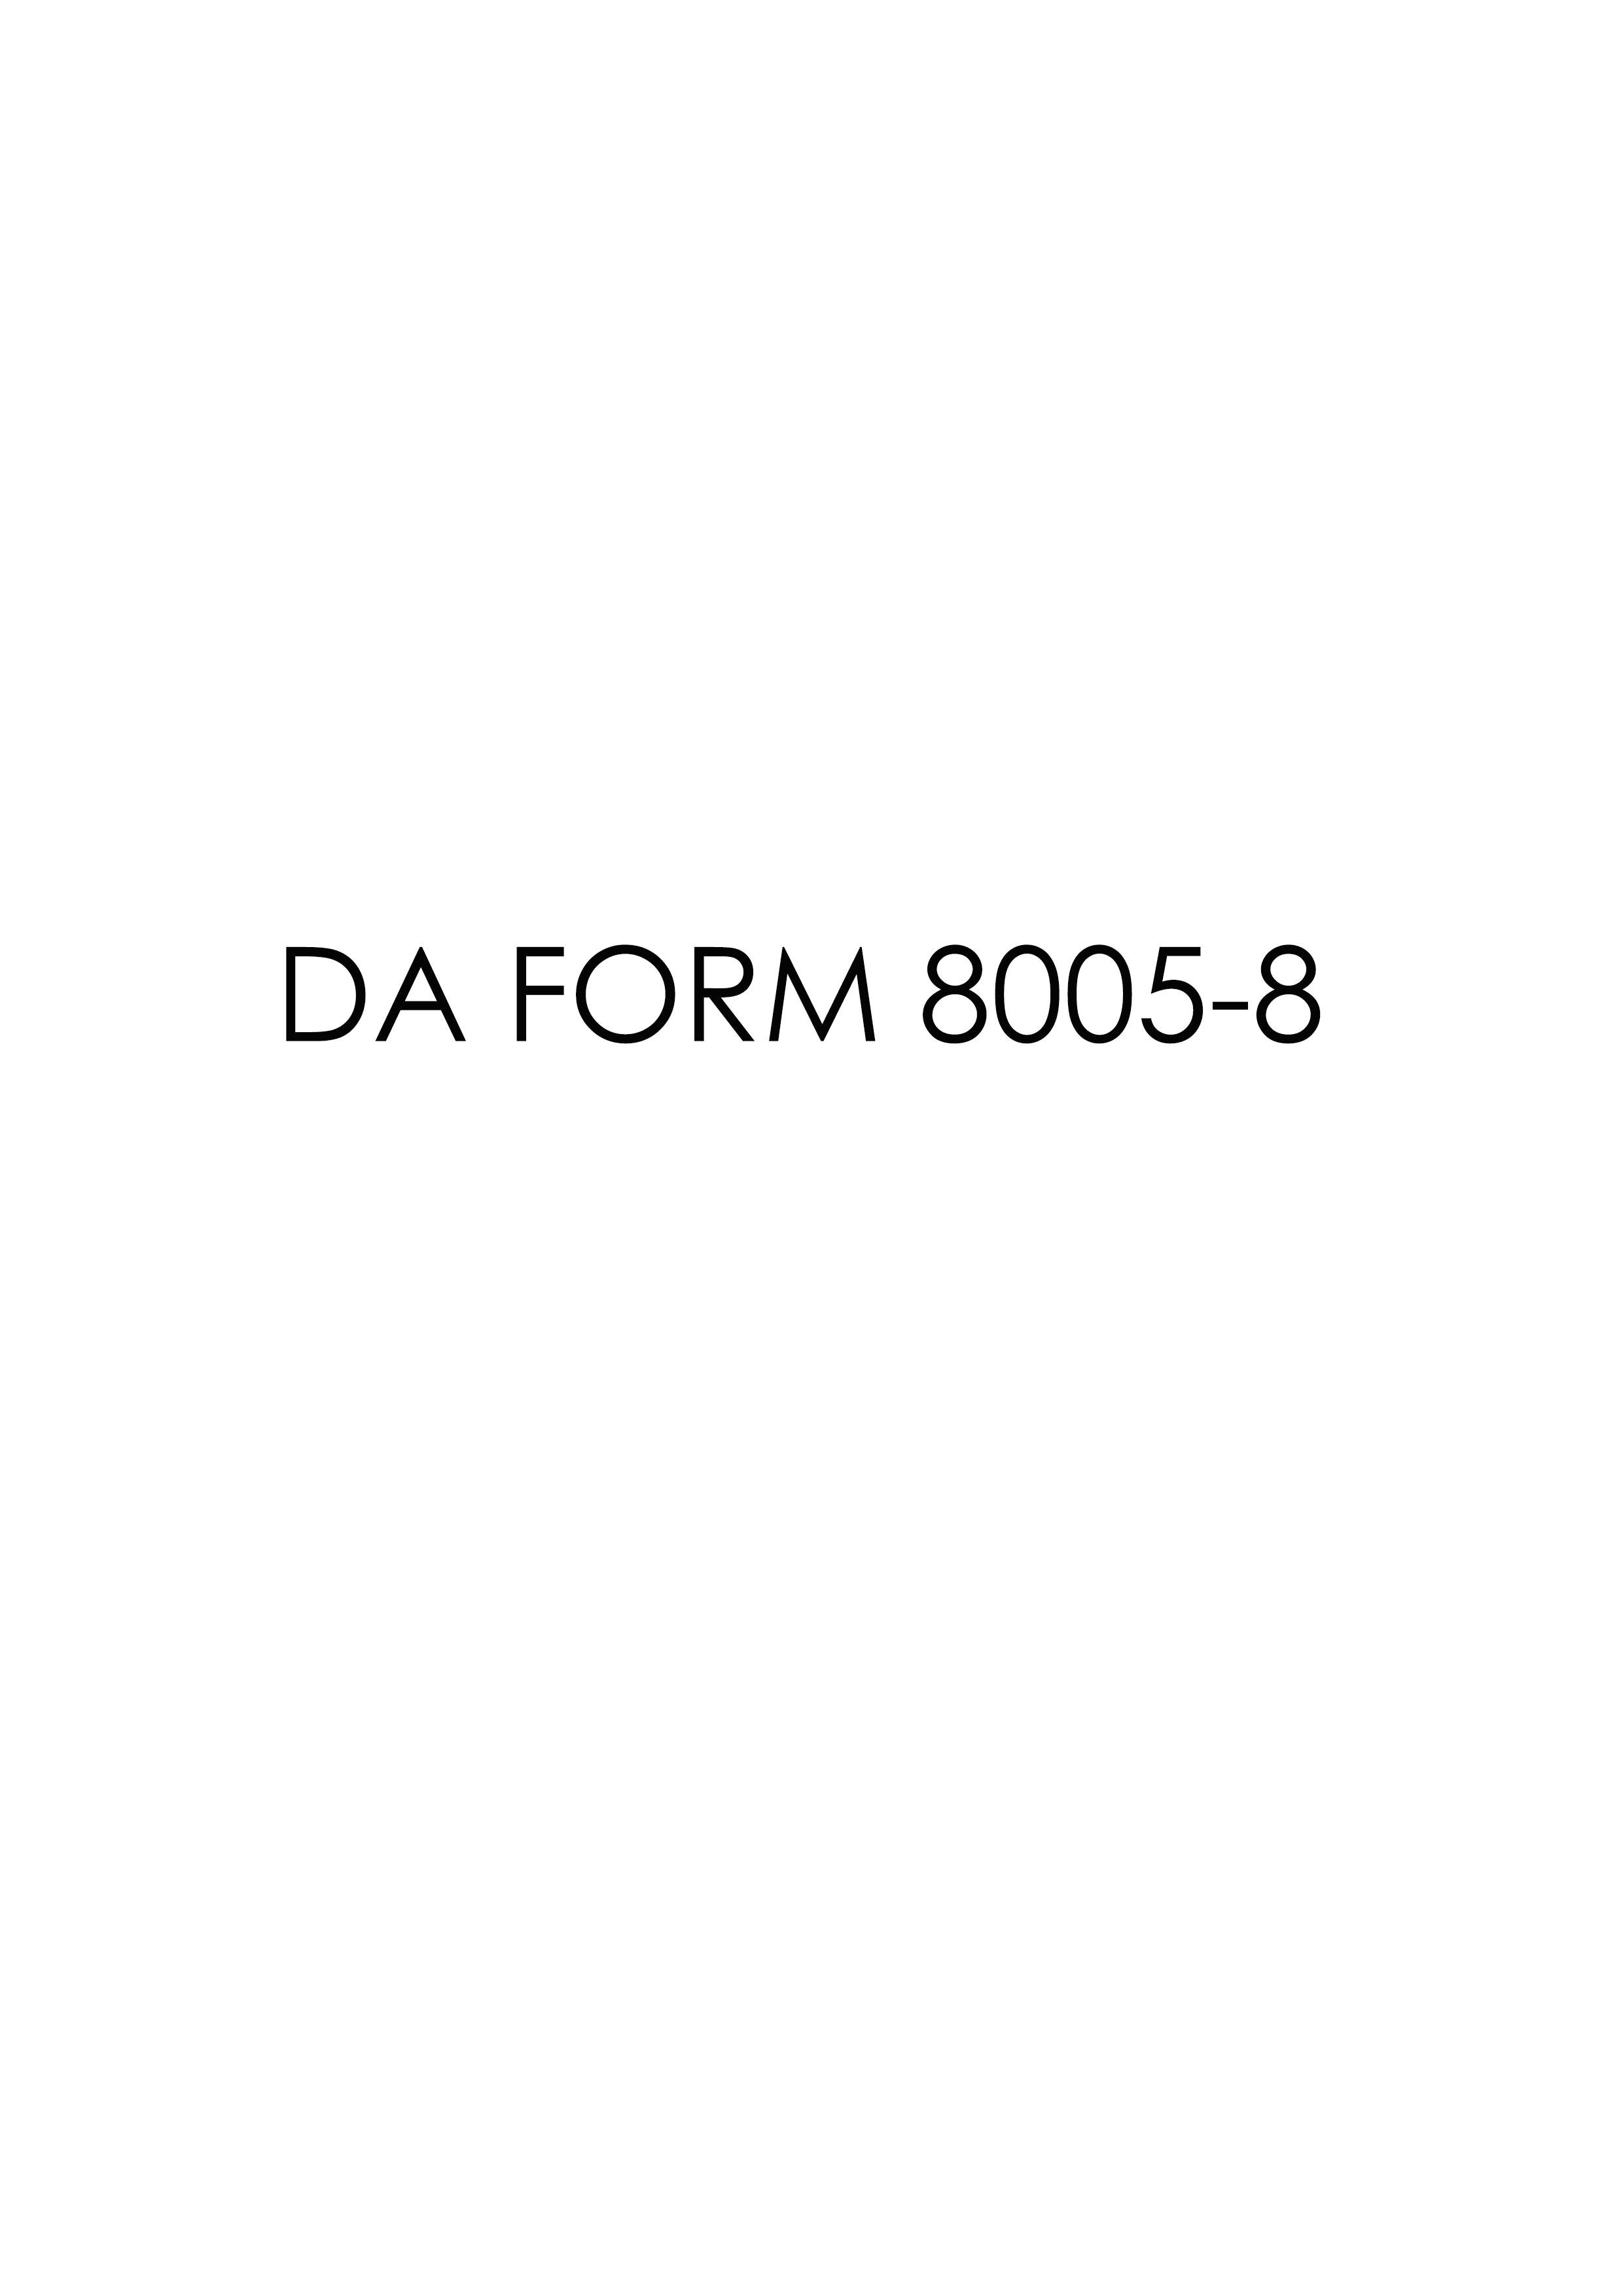 Download da Form 8005-8 Free